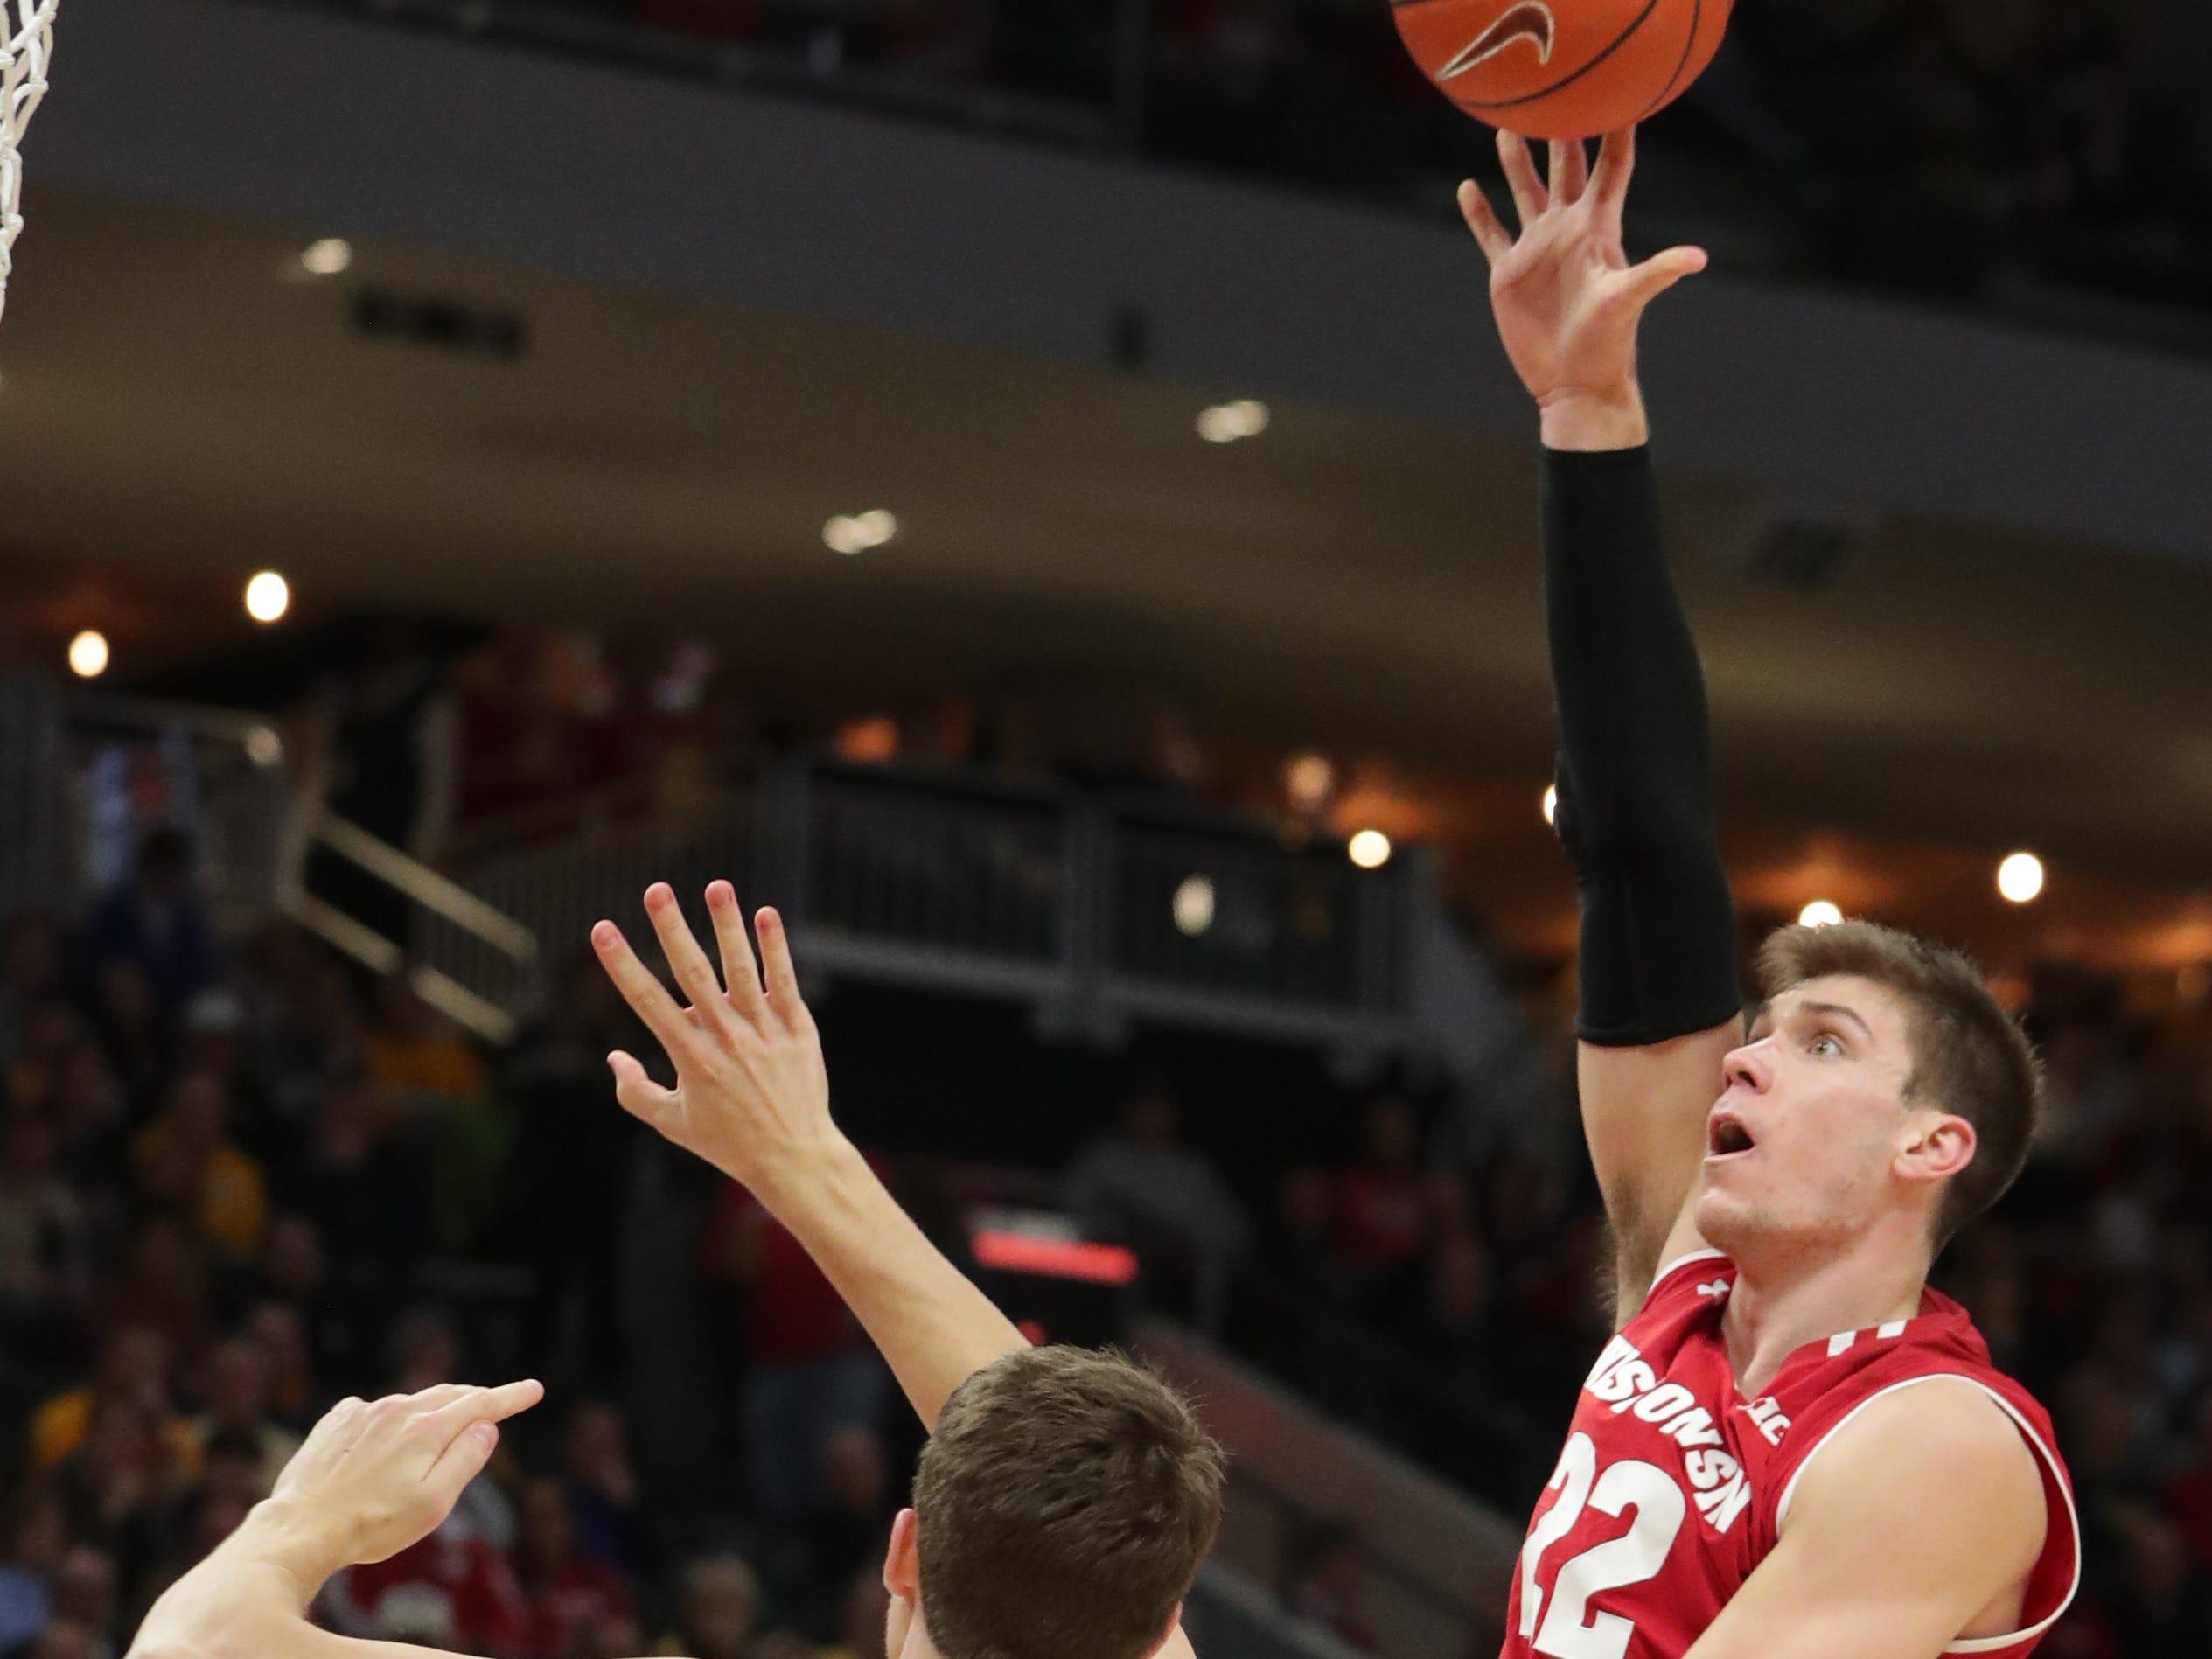 Wisconsin forward Ethan Happ shoots over Marquette center Matt Heldt.